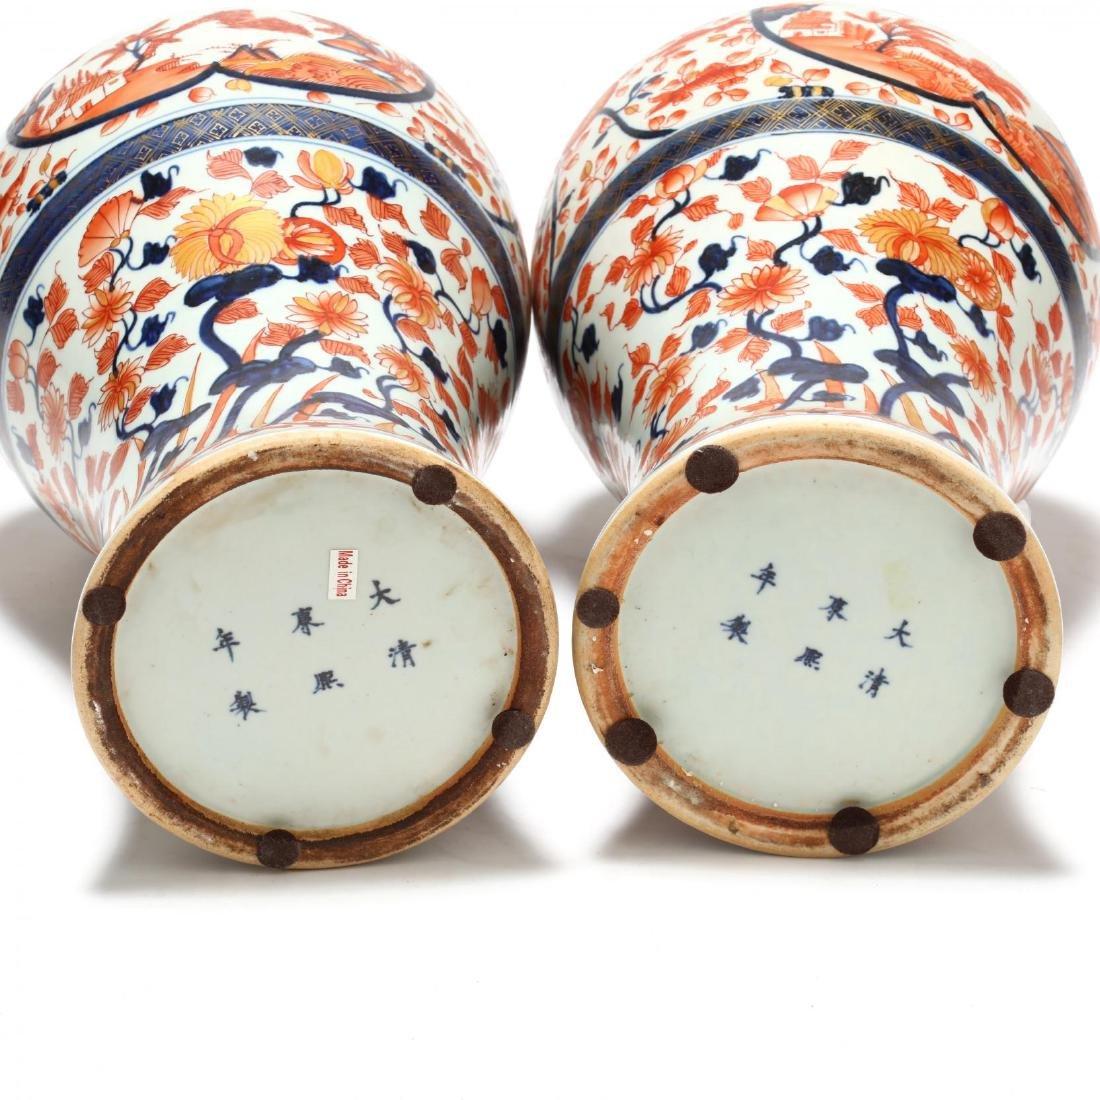 A Pair of Japanese Imari Covered Jars - 4